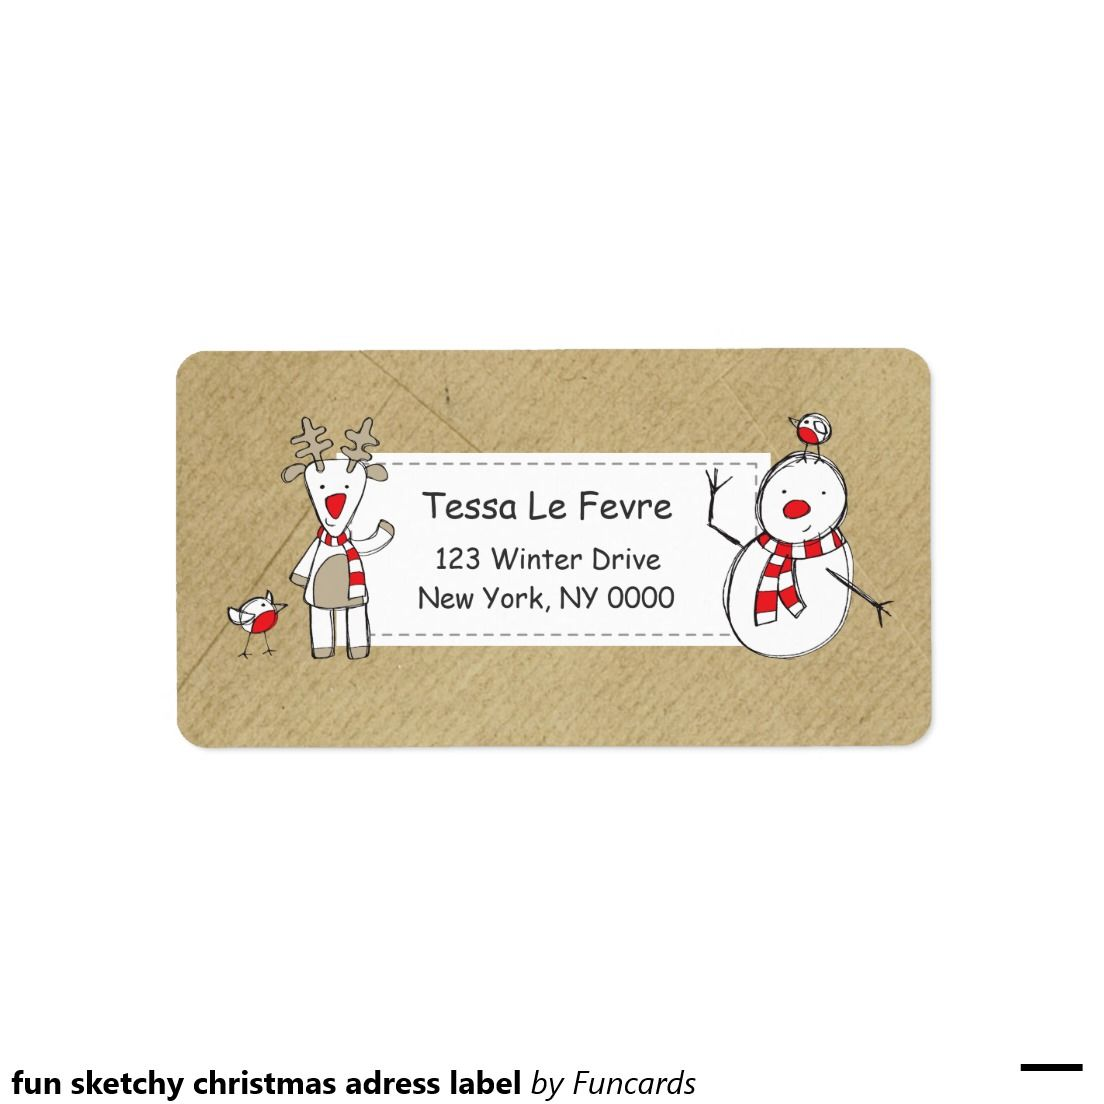 fun sketchy christmas adress label address label